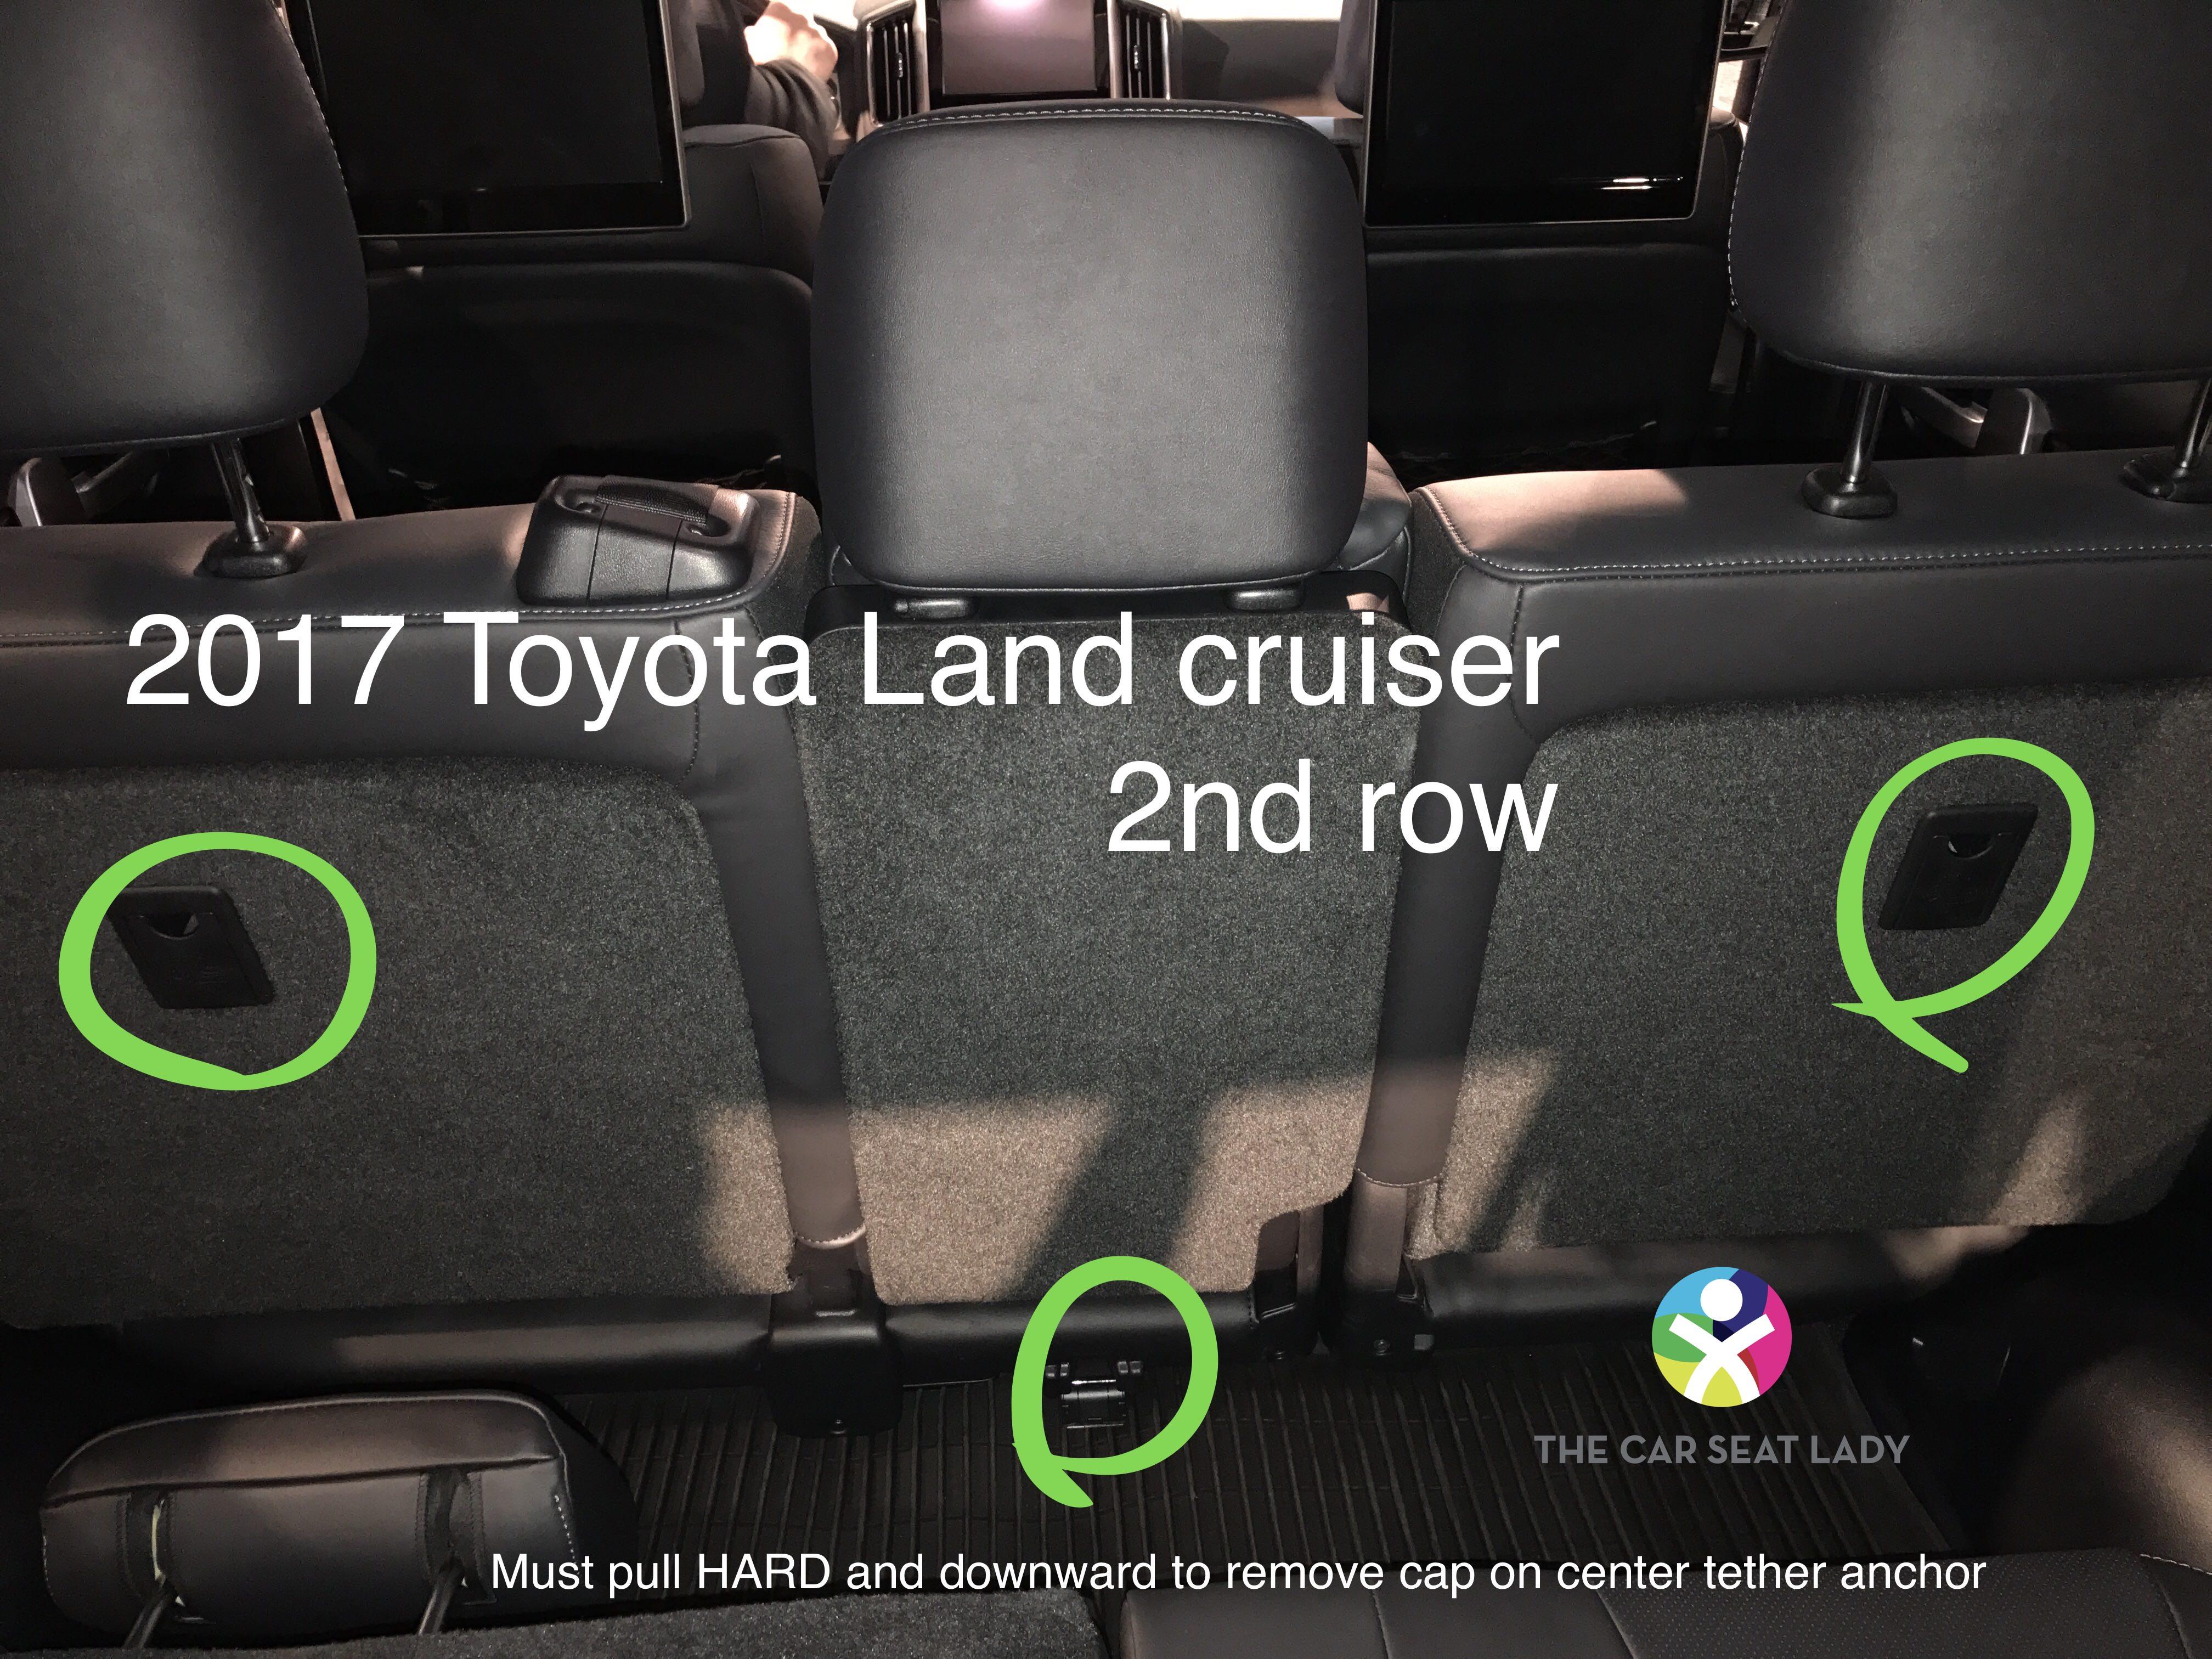 Toyota Land Cruiser 2017 >> The Car Seat LadyToyota Land Cruiser - The Car Seat Lady